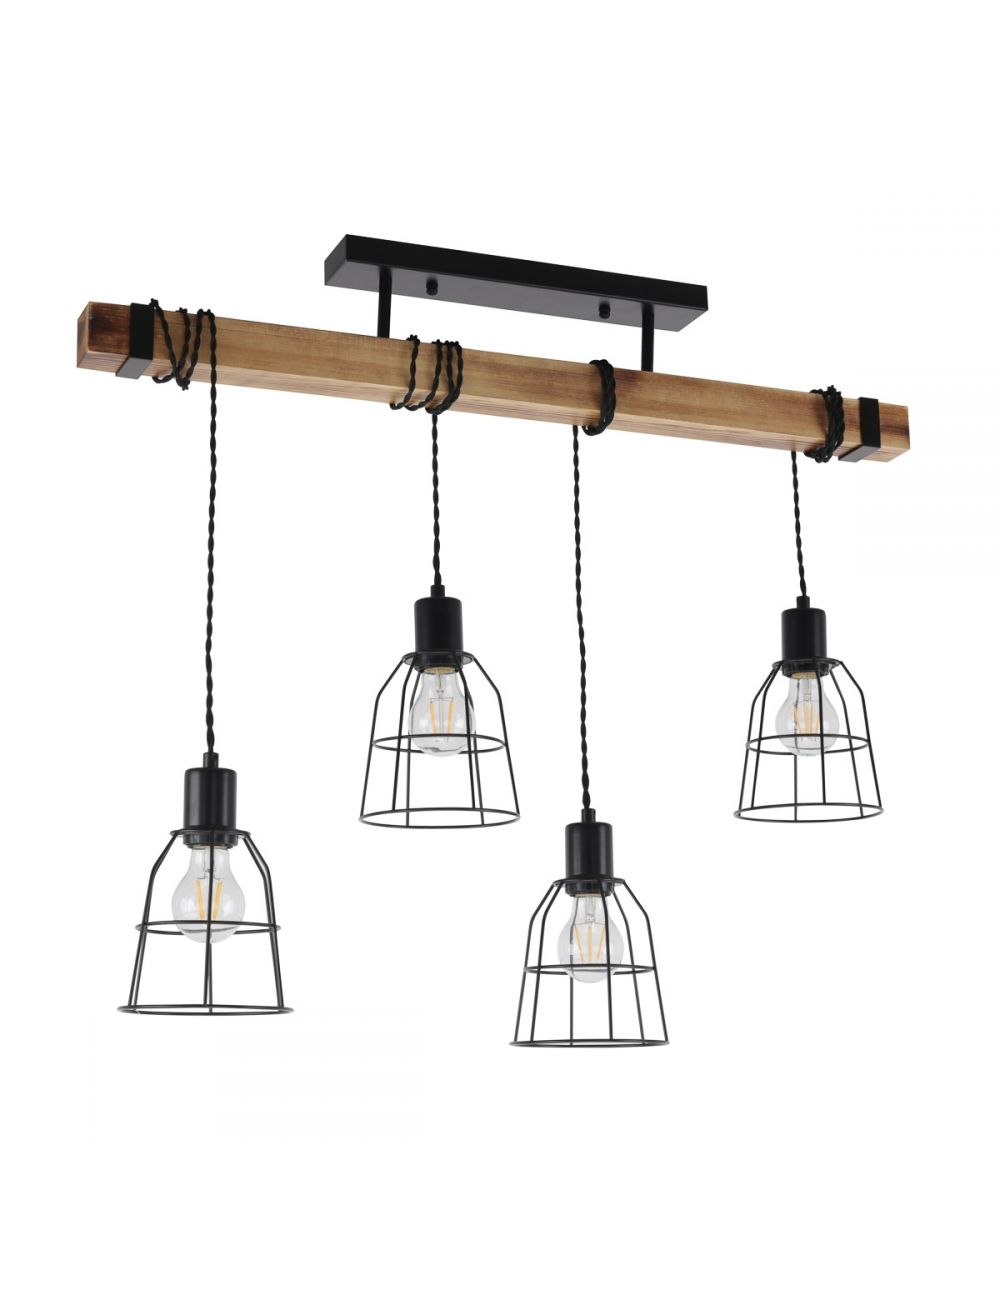 Lampa wisząca belka drewniana loft industrialna Ponte Italux PPND-4290-4-L